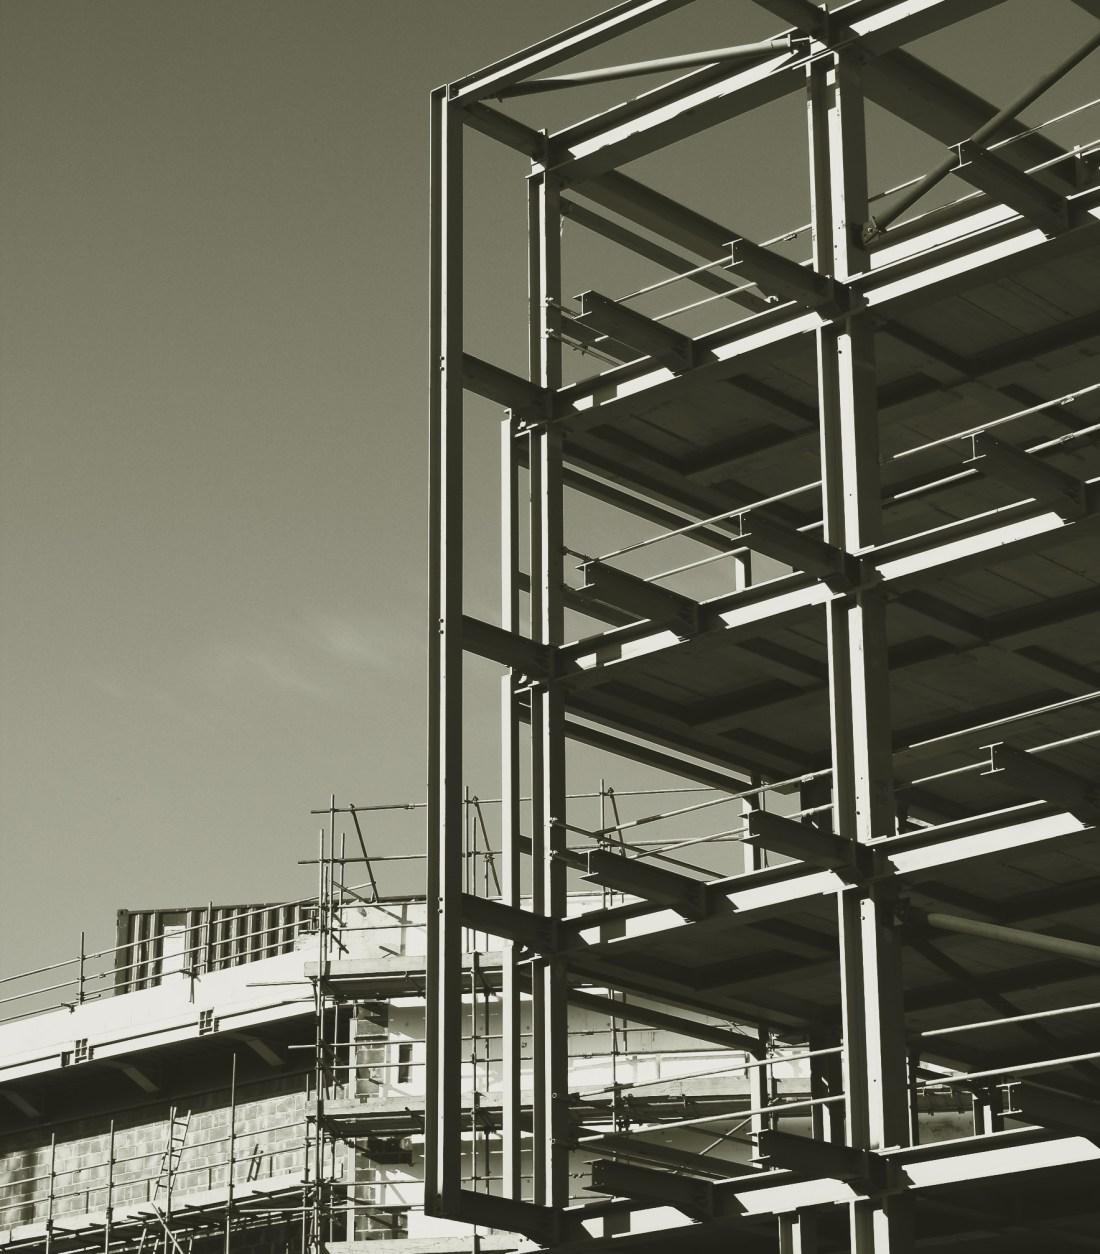 Piane Construction